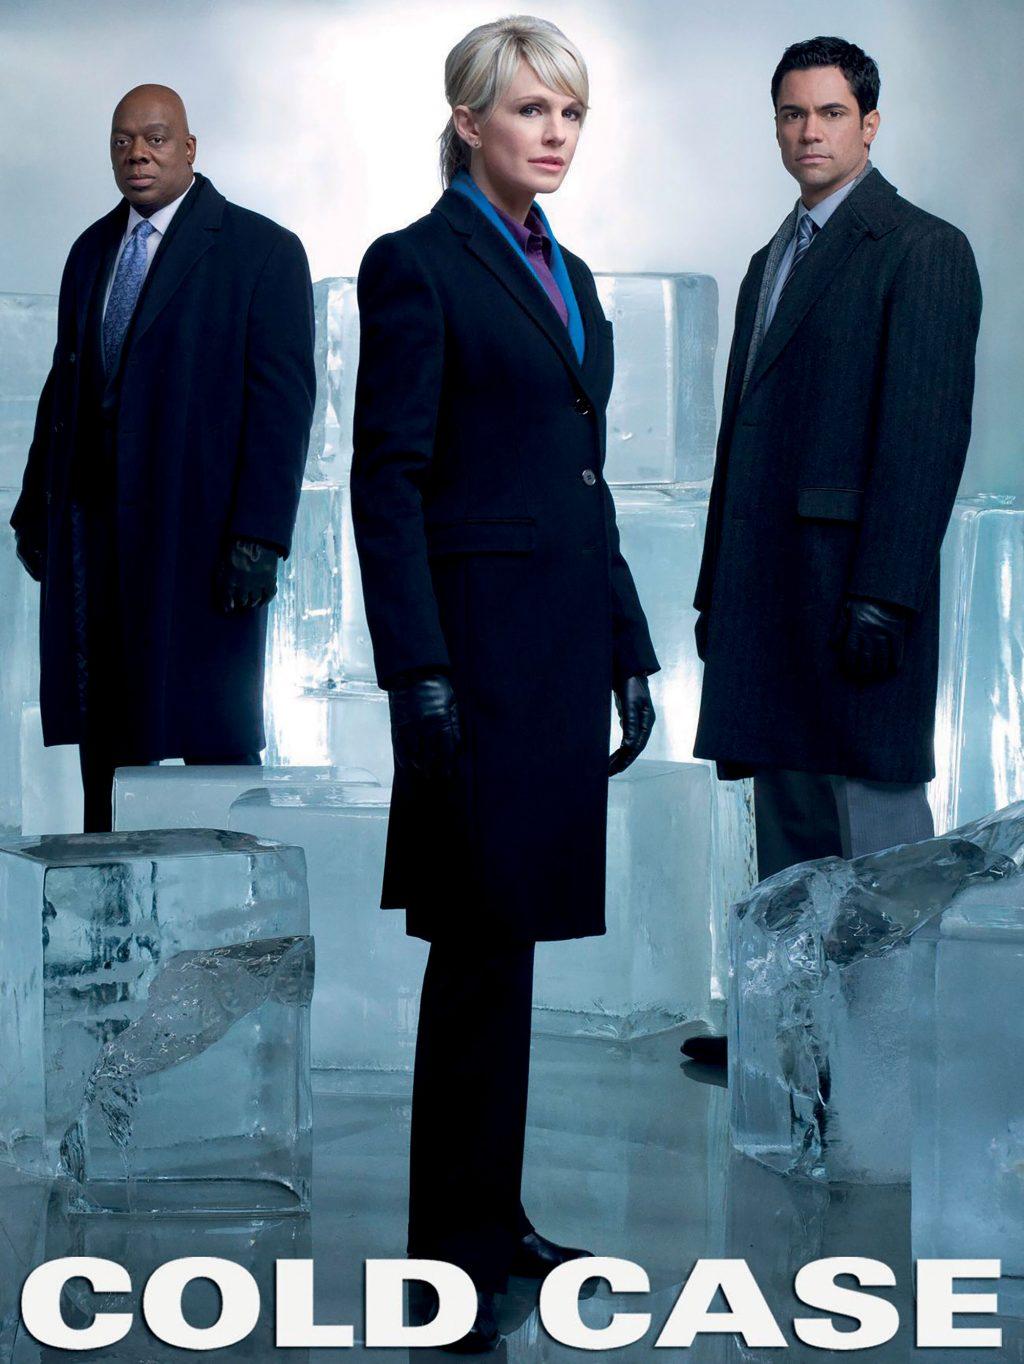 phim trinh thám Cold Case